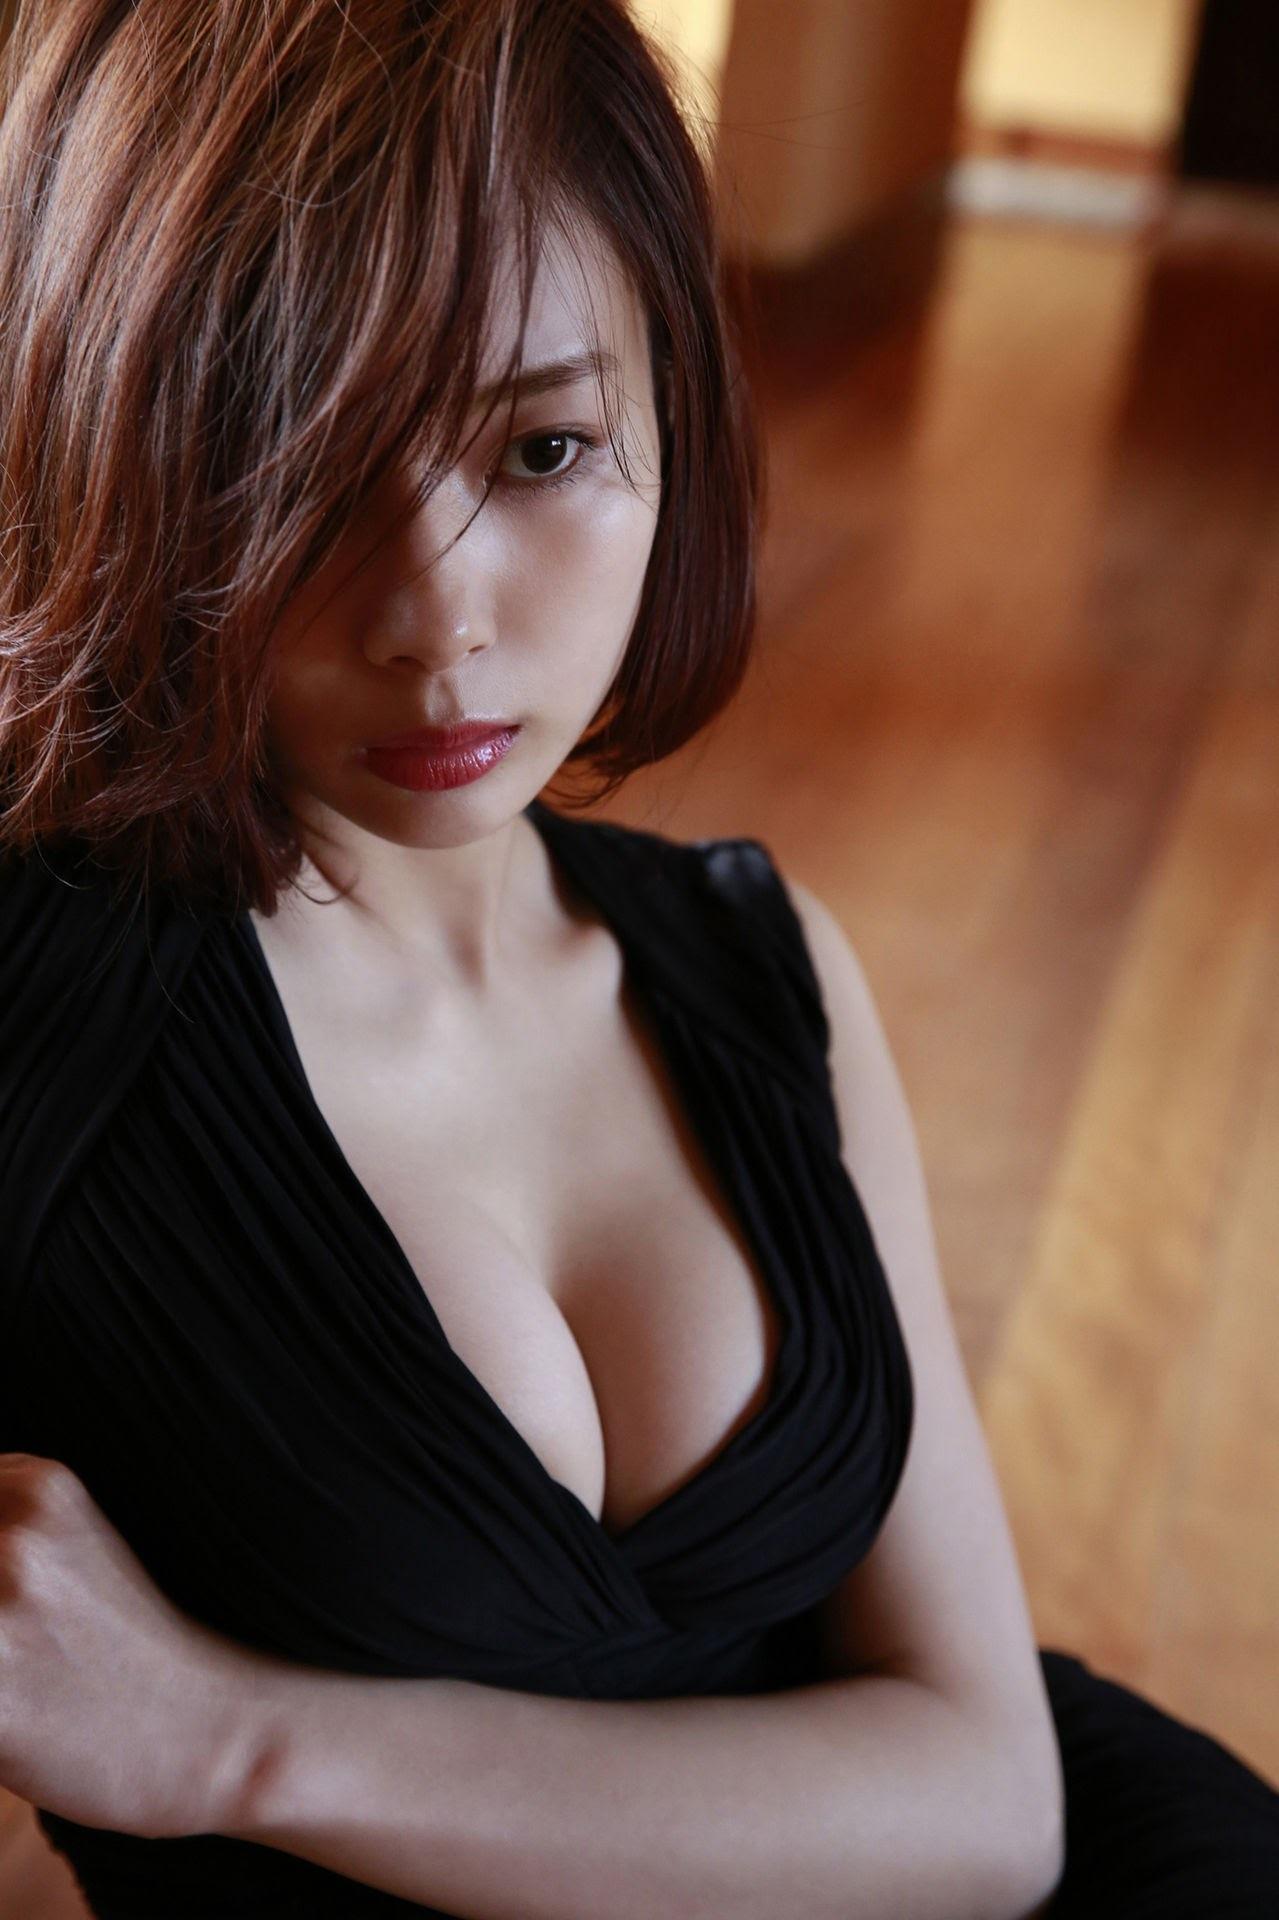 23 years old Shaka Okada, who is also a professional mahjong player053